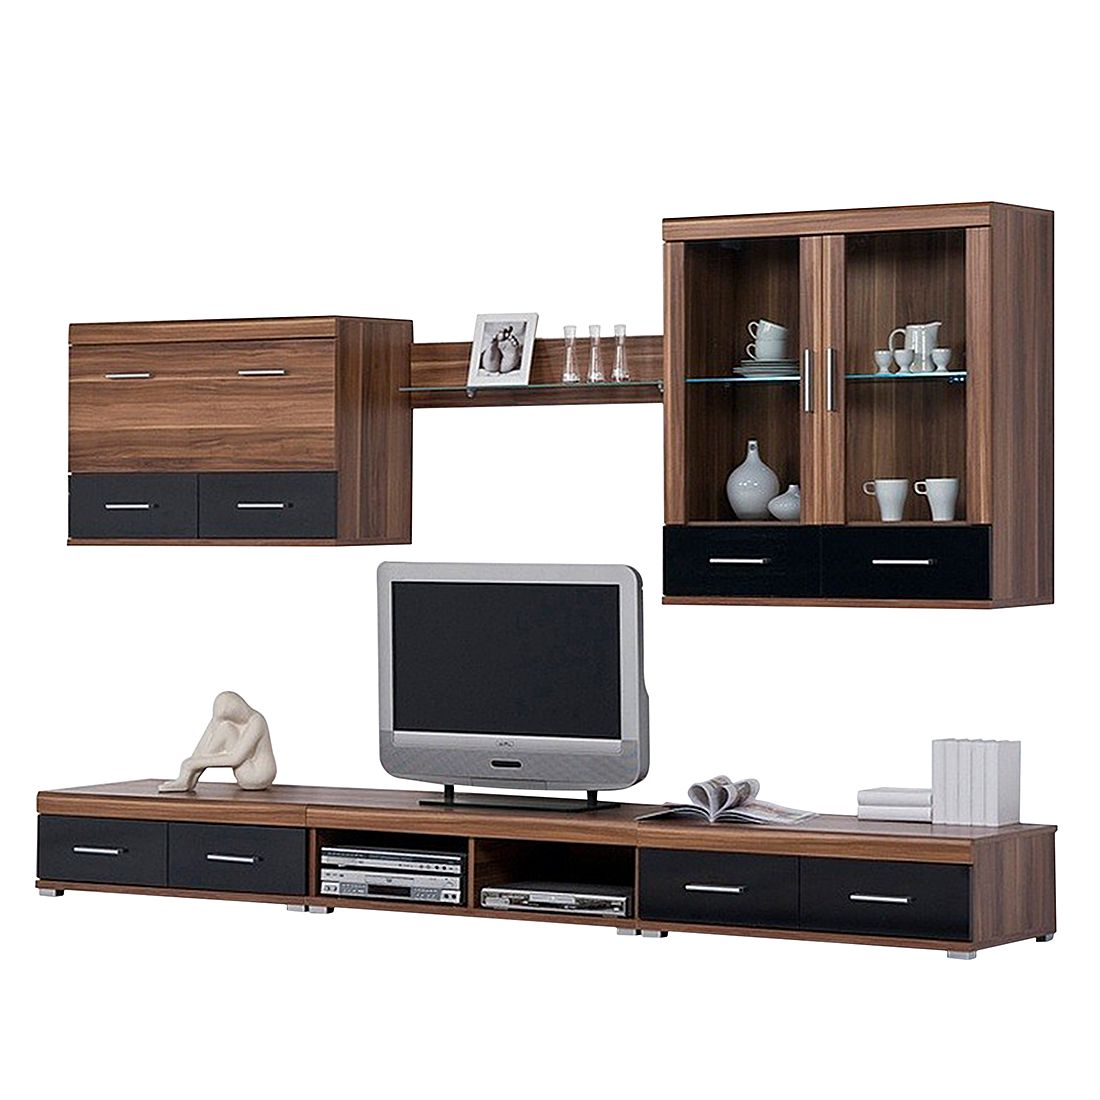 wohnwand leo iii ohne beleuchtung walnuss dekor. Black Bedroom Furniture Sets. Home Design Ideas